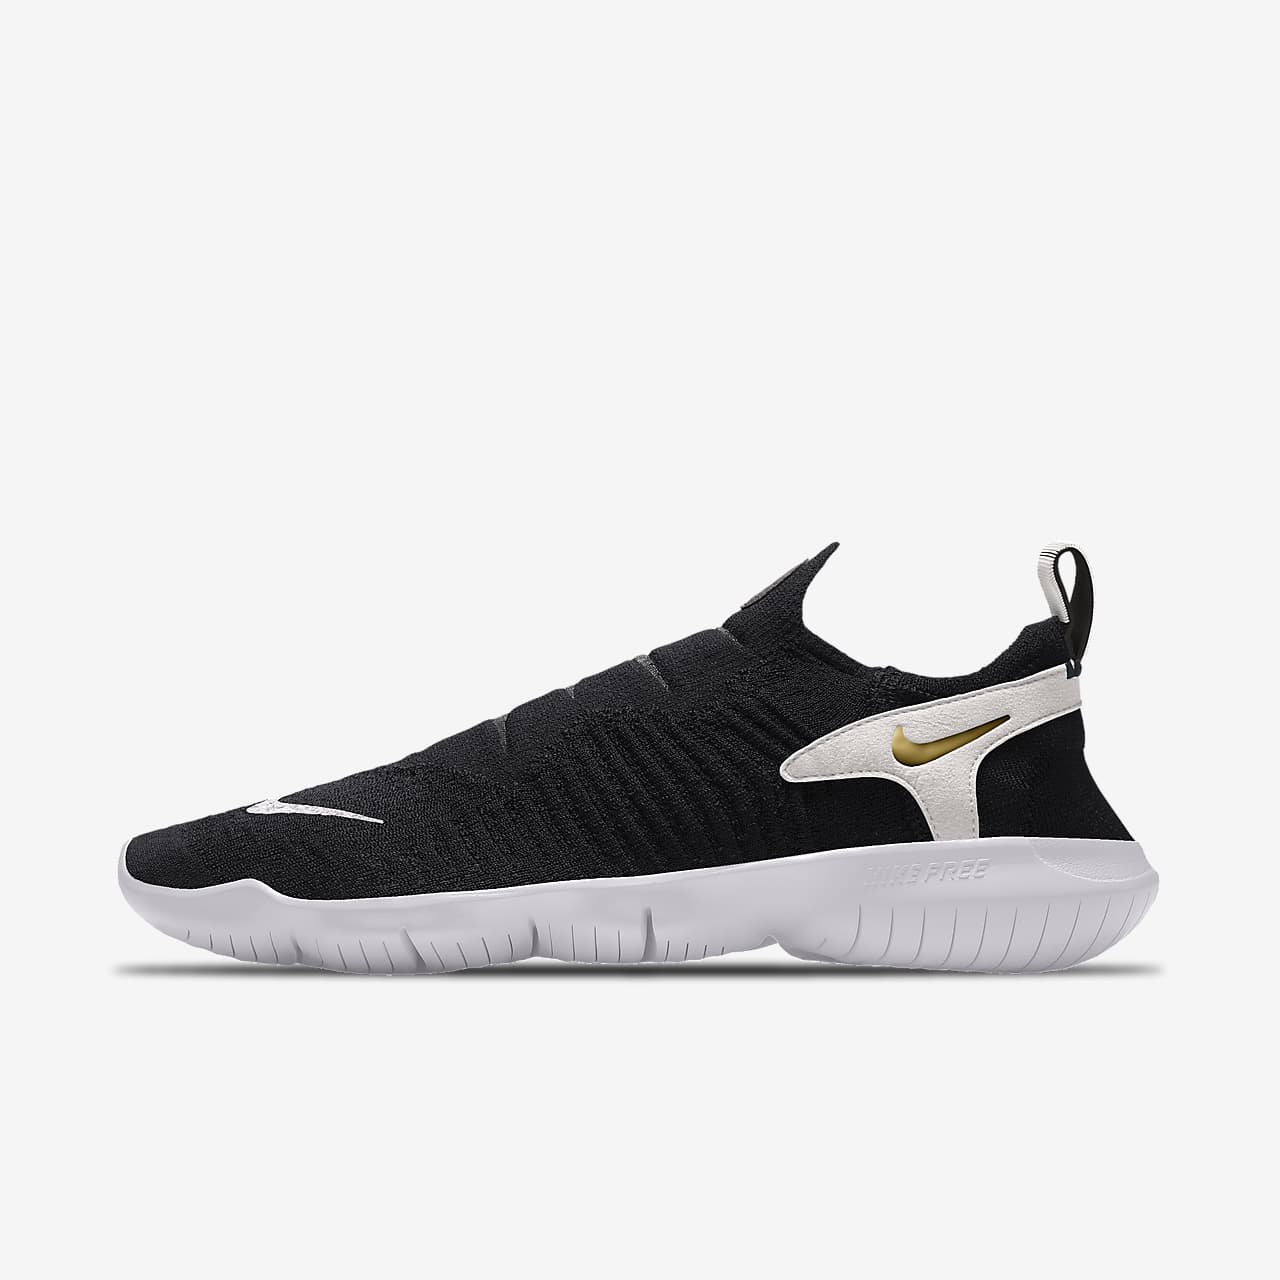 Nike Free RN Flyknit 3.0 By You 客製女款跑鞋